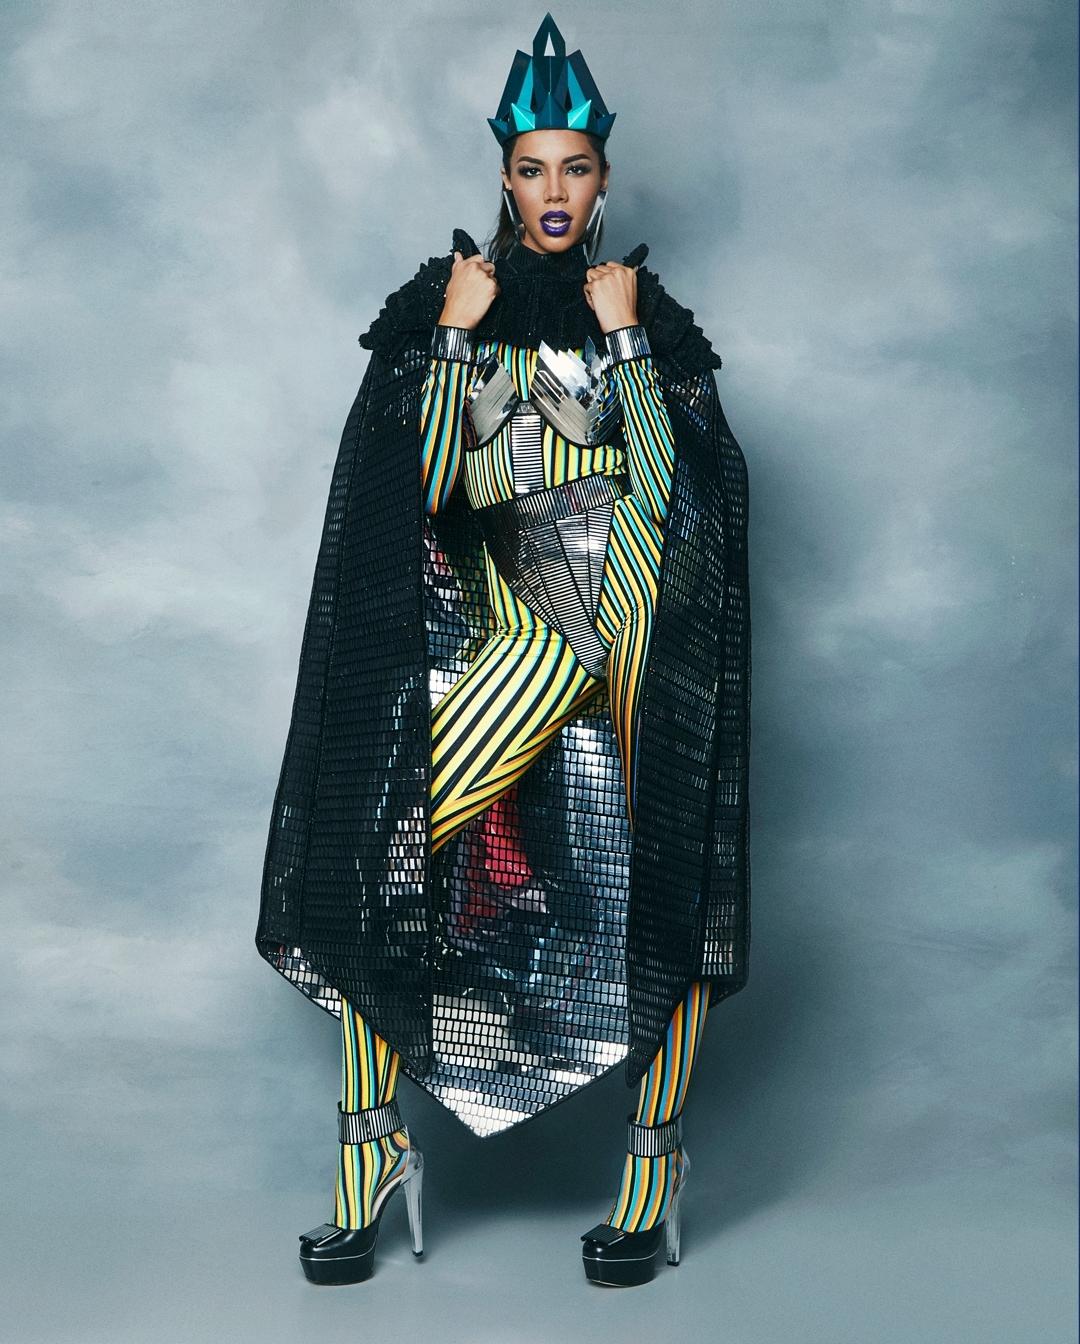 trajes tipicos de candidatas a miss universe 2019. - Página 2 I7OreE